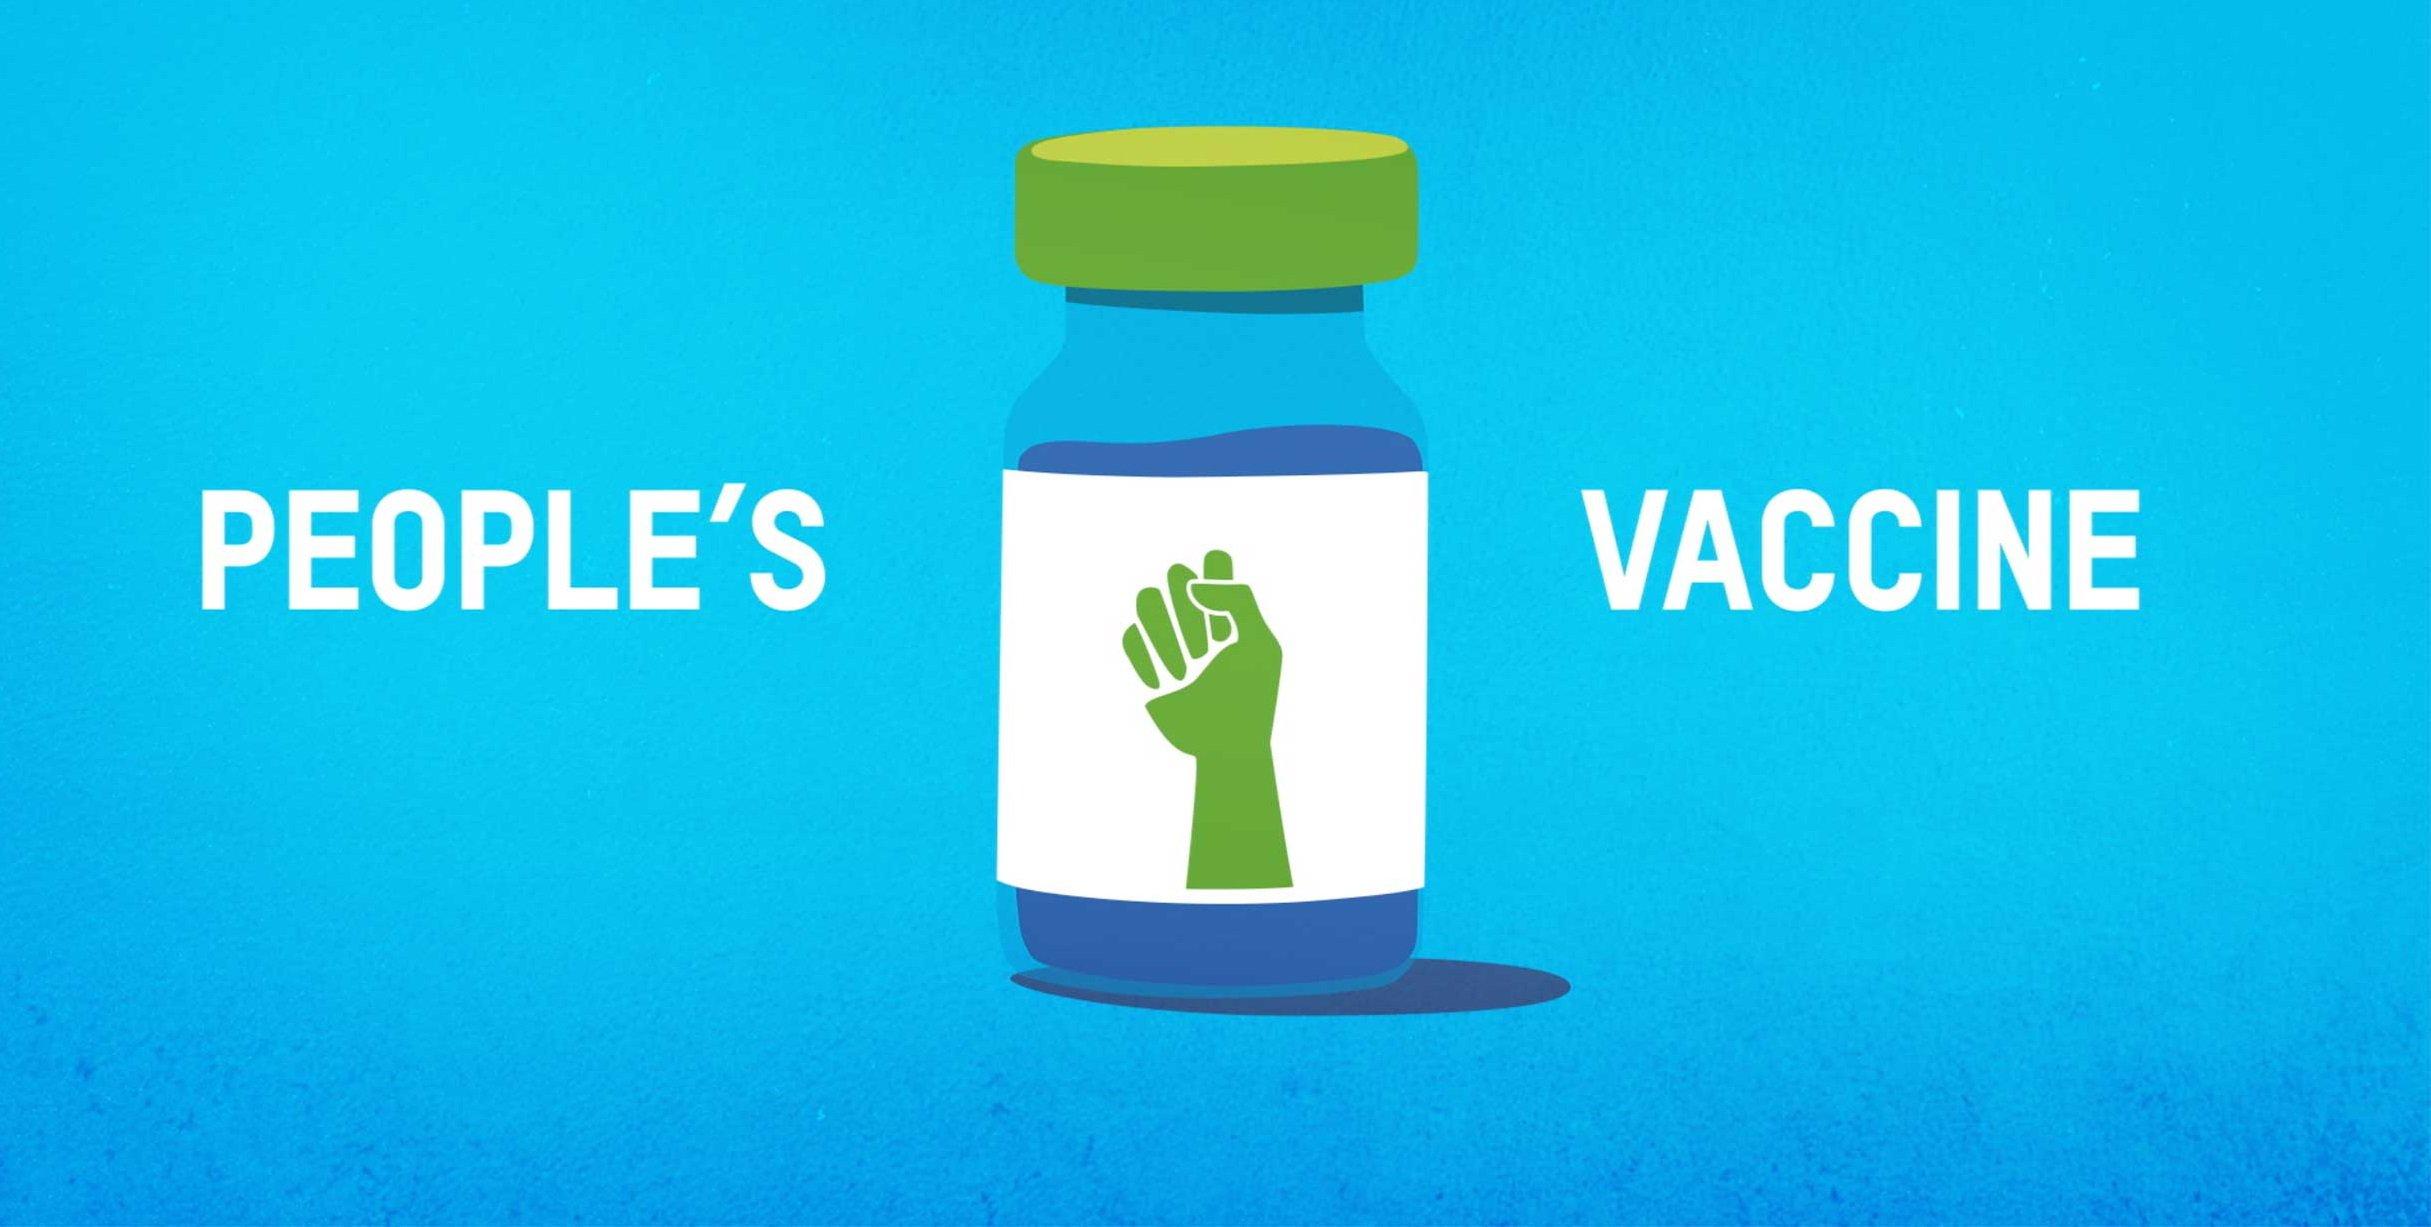 peoples_vaccine_still (3).jpg